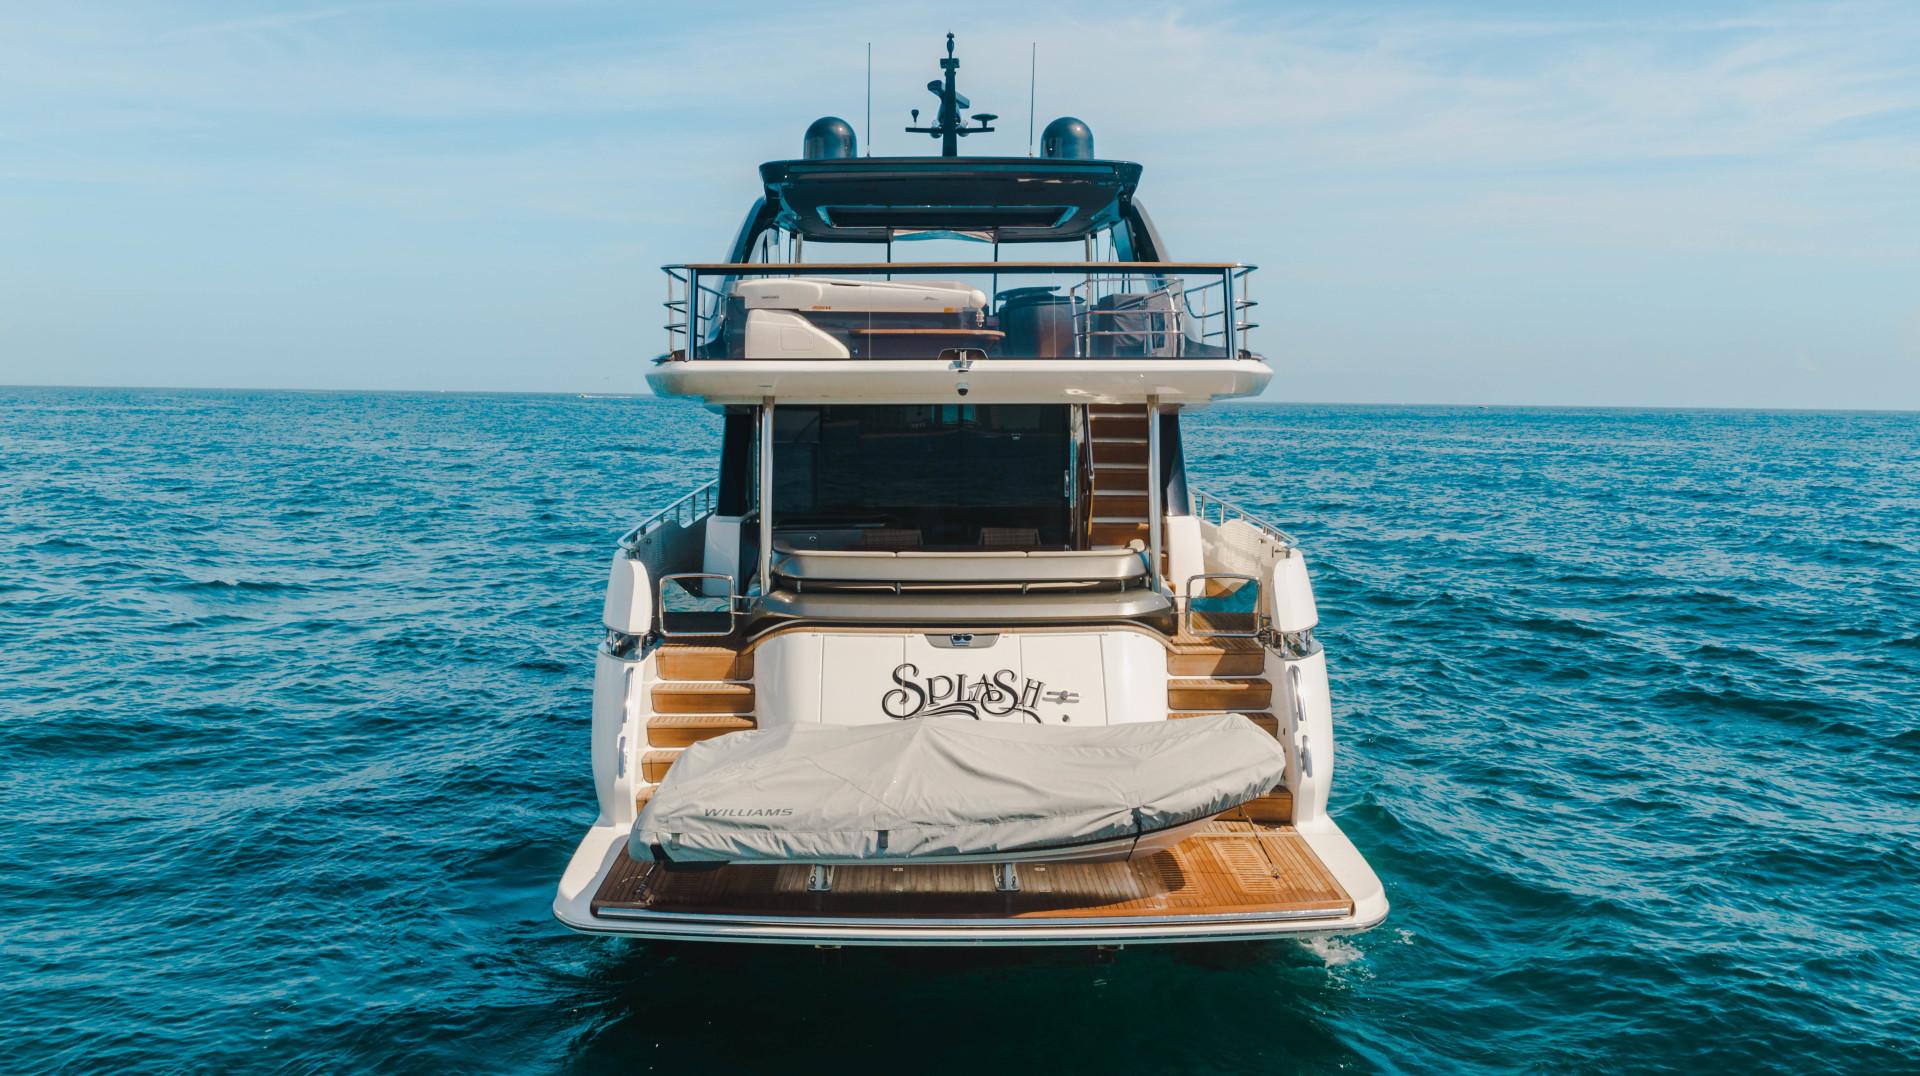 Princess-Y85  2019-Splash Delray Beach-Florida-United States-1631583 | Thumbnail